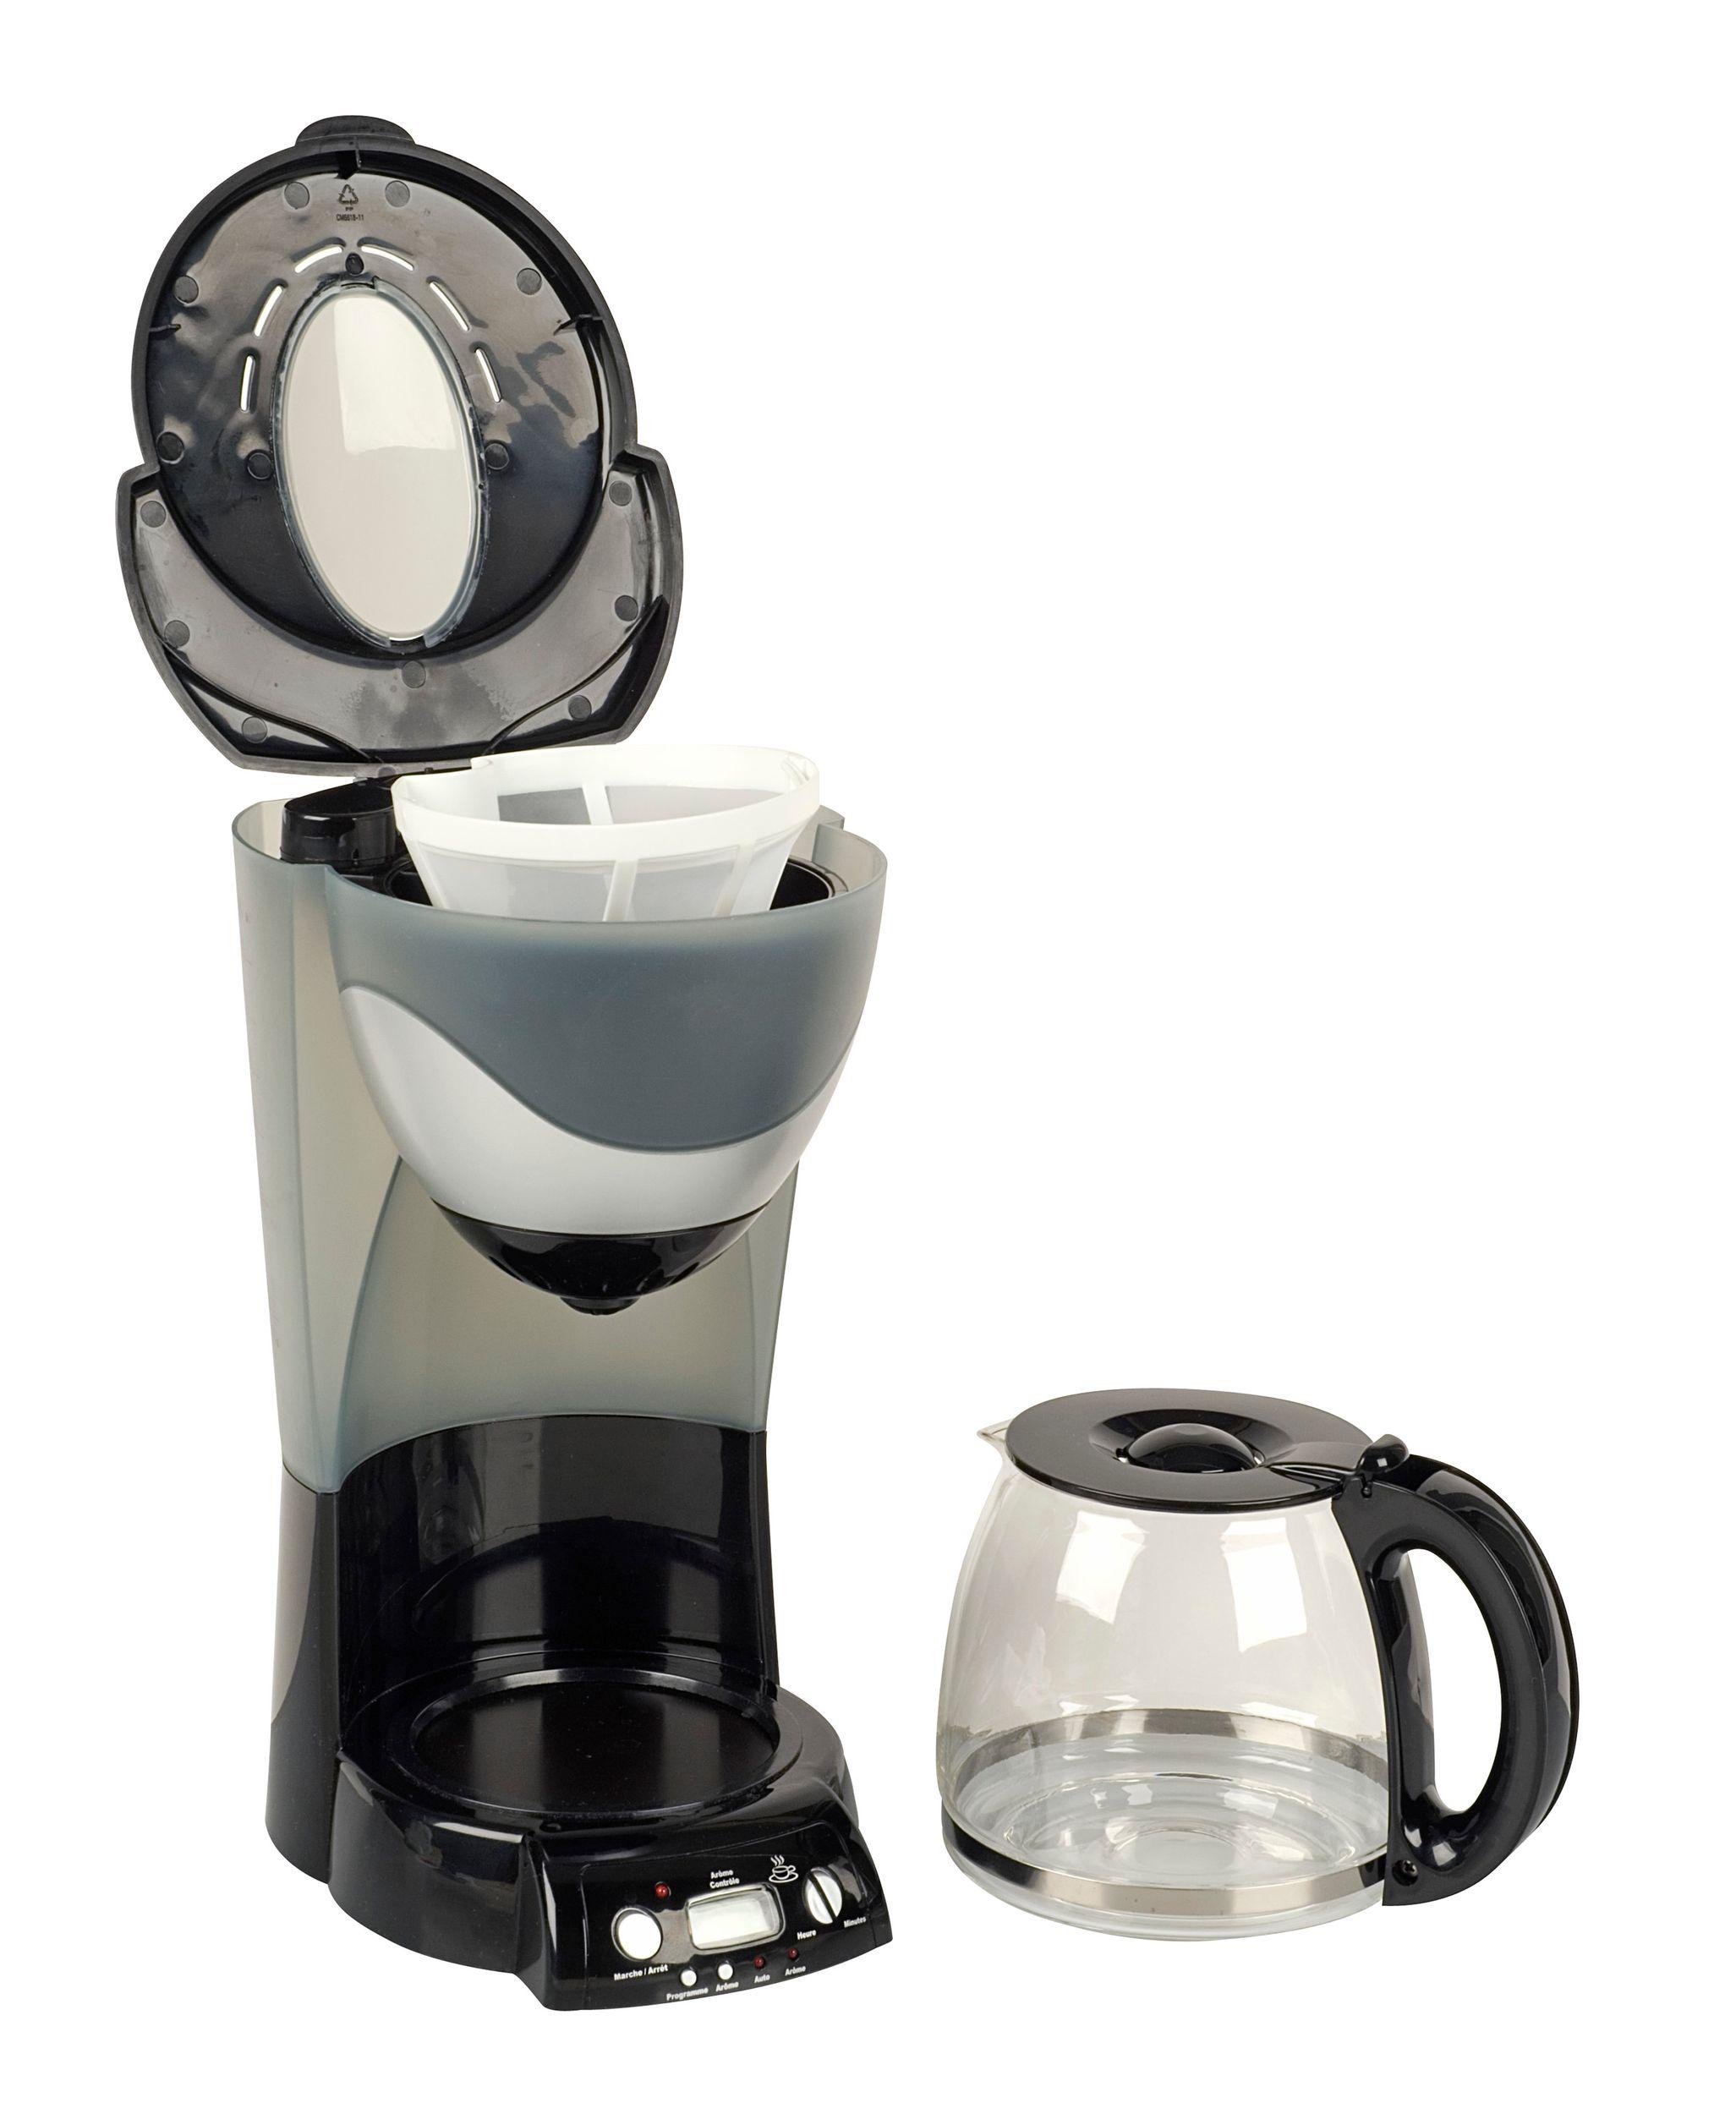 Kaffeemaschine Timer Kaffeeautomat Glaskanne Aroma-Schalter NEU*97051 Bild 2